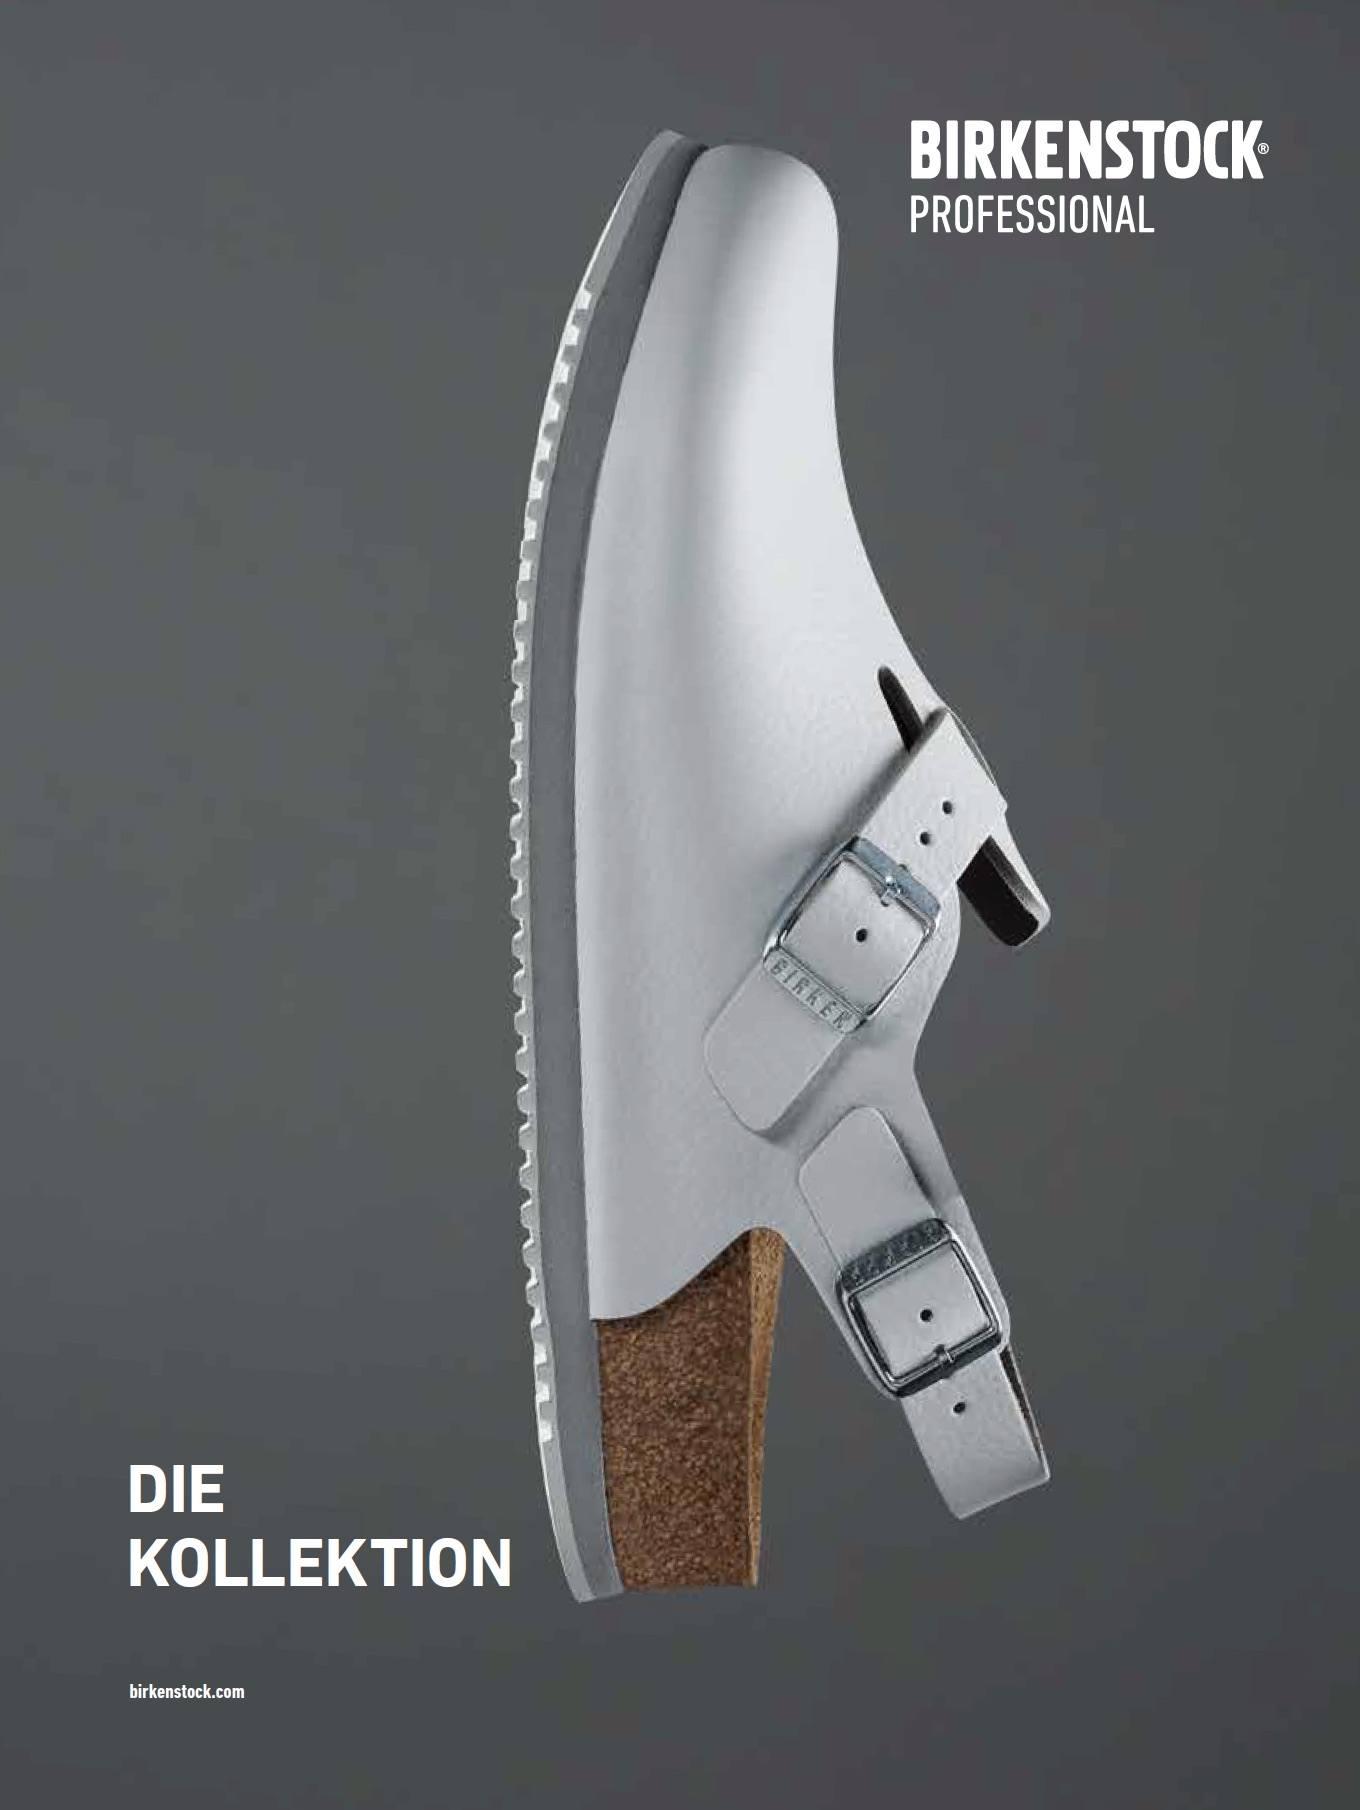 Birkenstock-Professional-Katalog